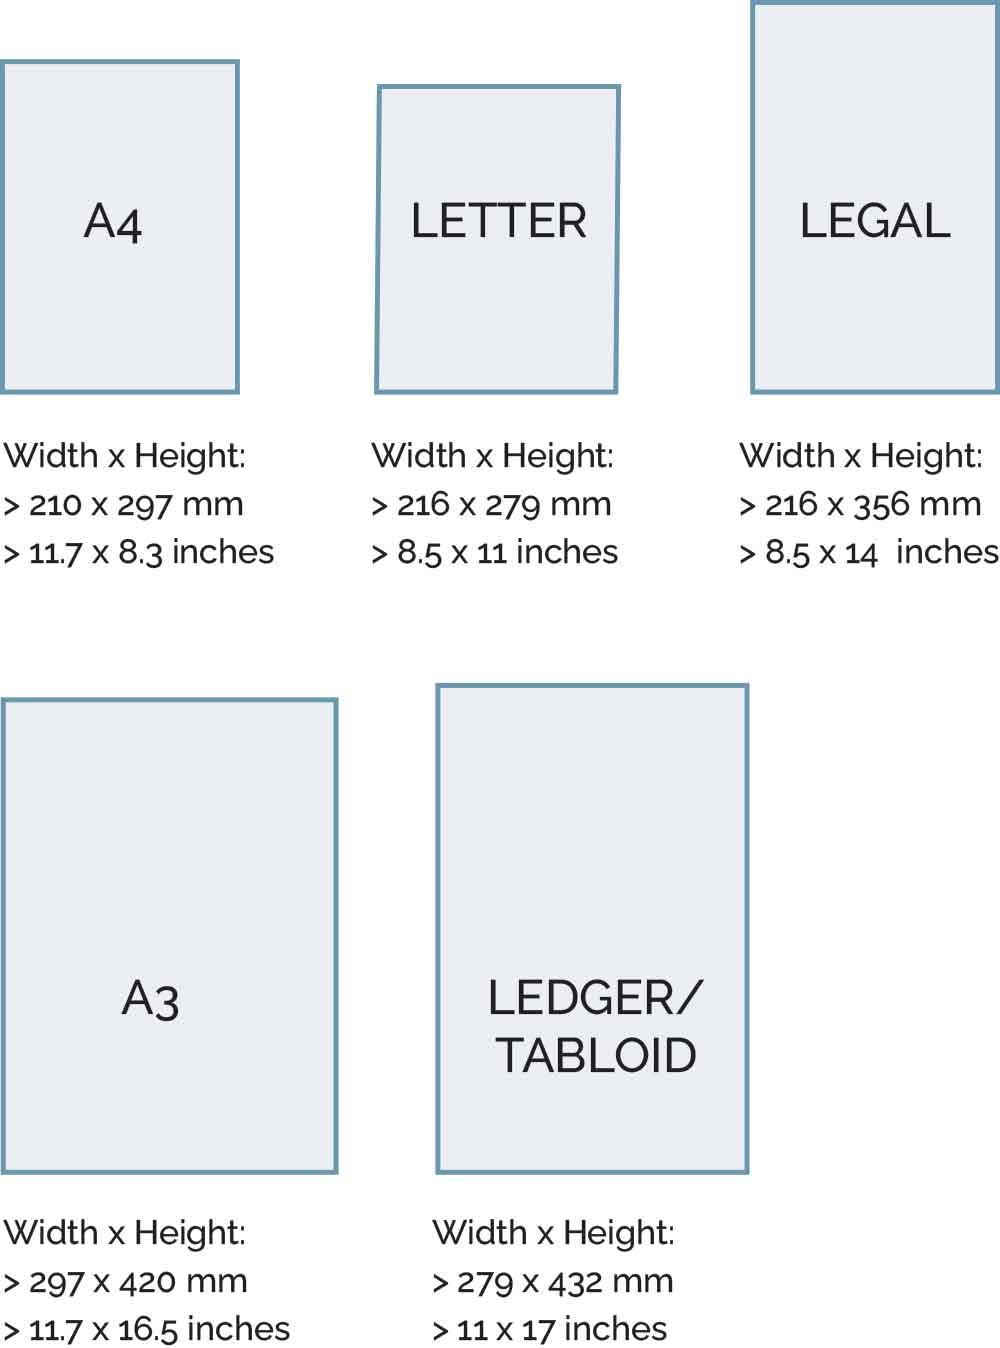 ISO216 vs American Standard comparative sizes